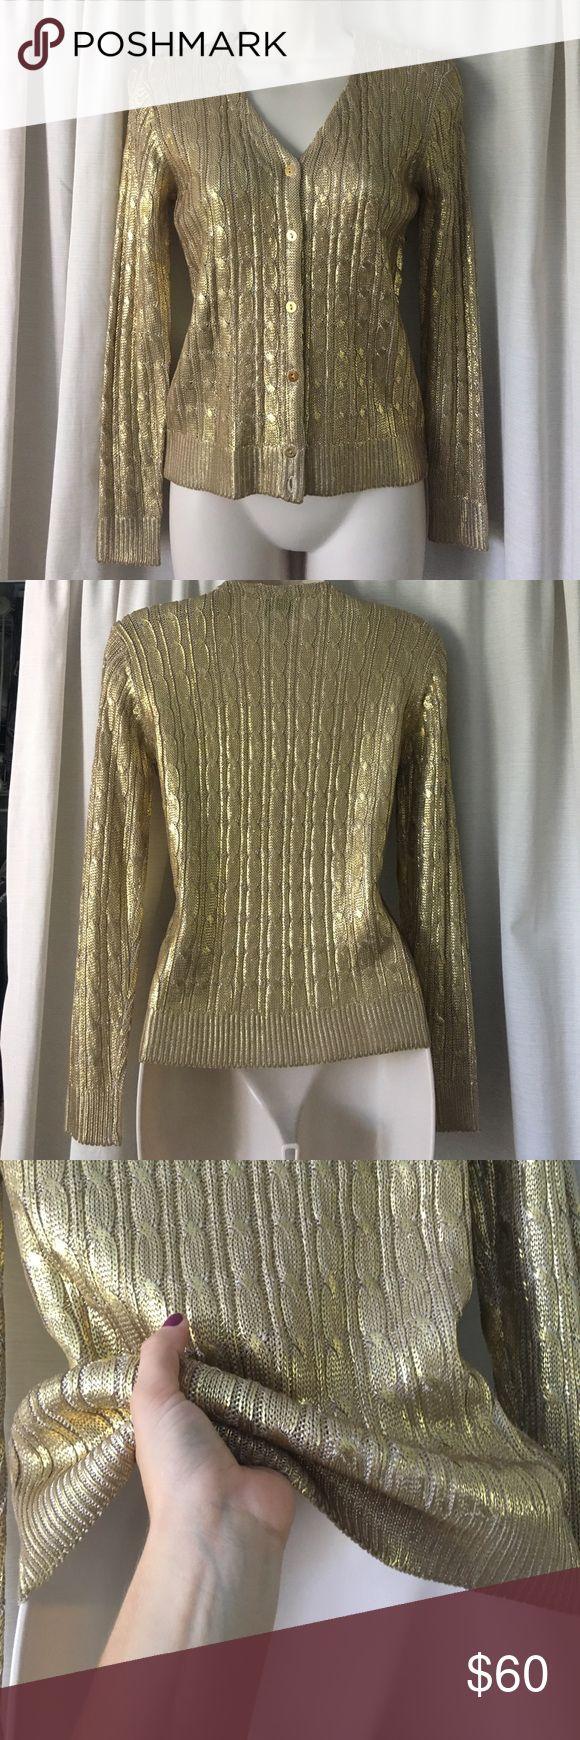 Oscar de La Renta Stunning knit sweater with gold Oscar de la Renta Sweaters Cardigans